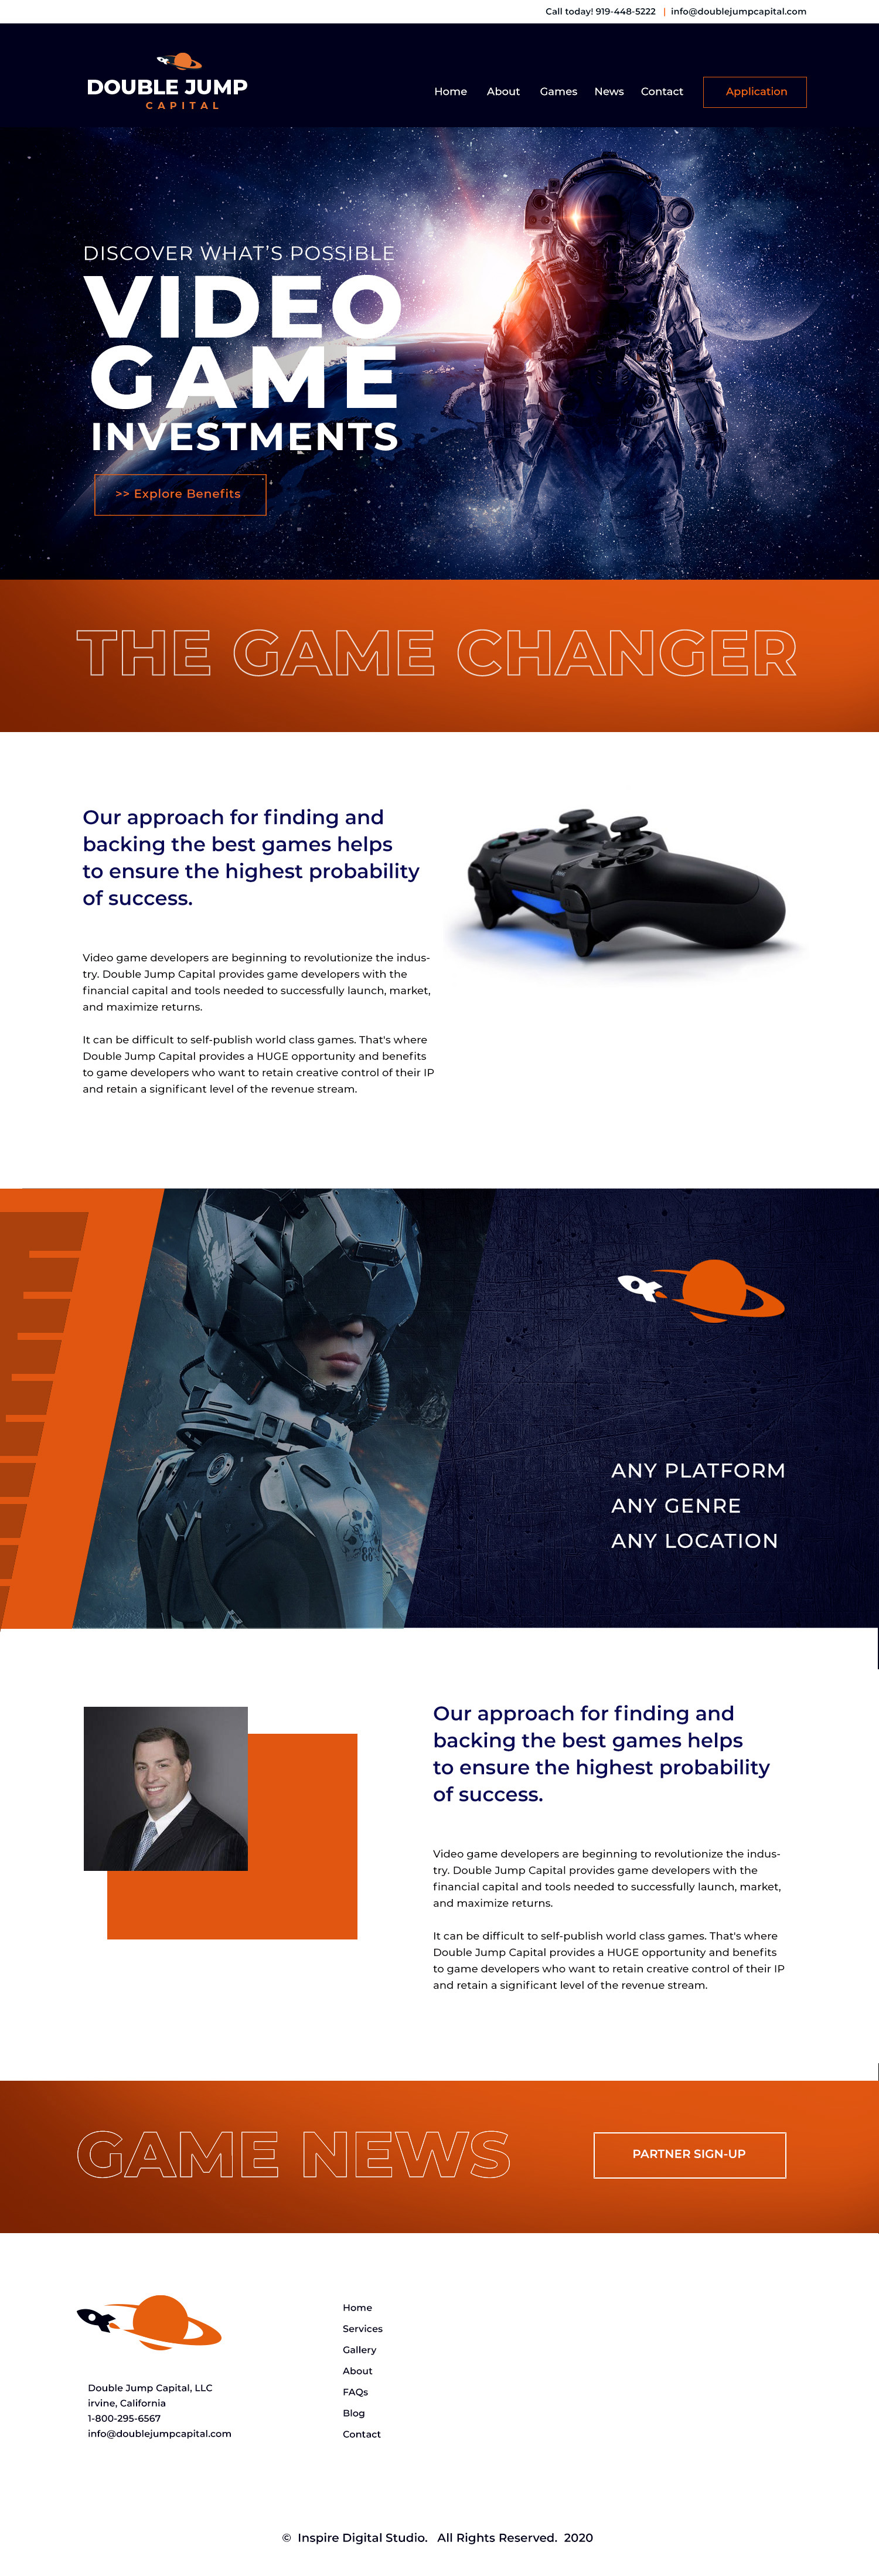 Orange County Brand Agency - Website Design - UI/UX Design